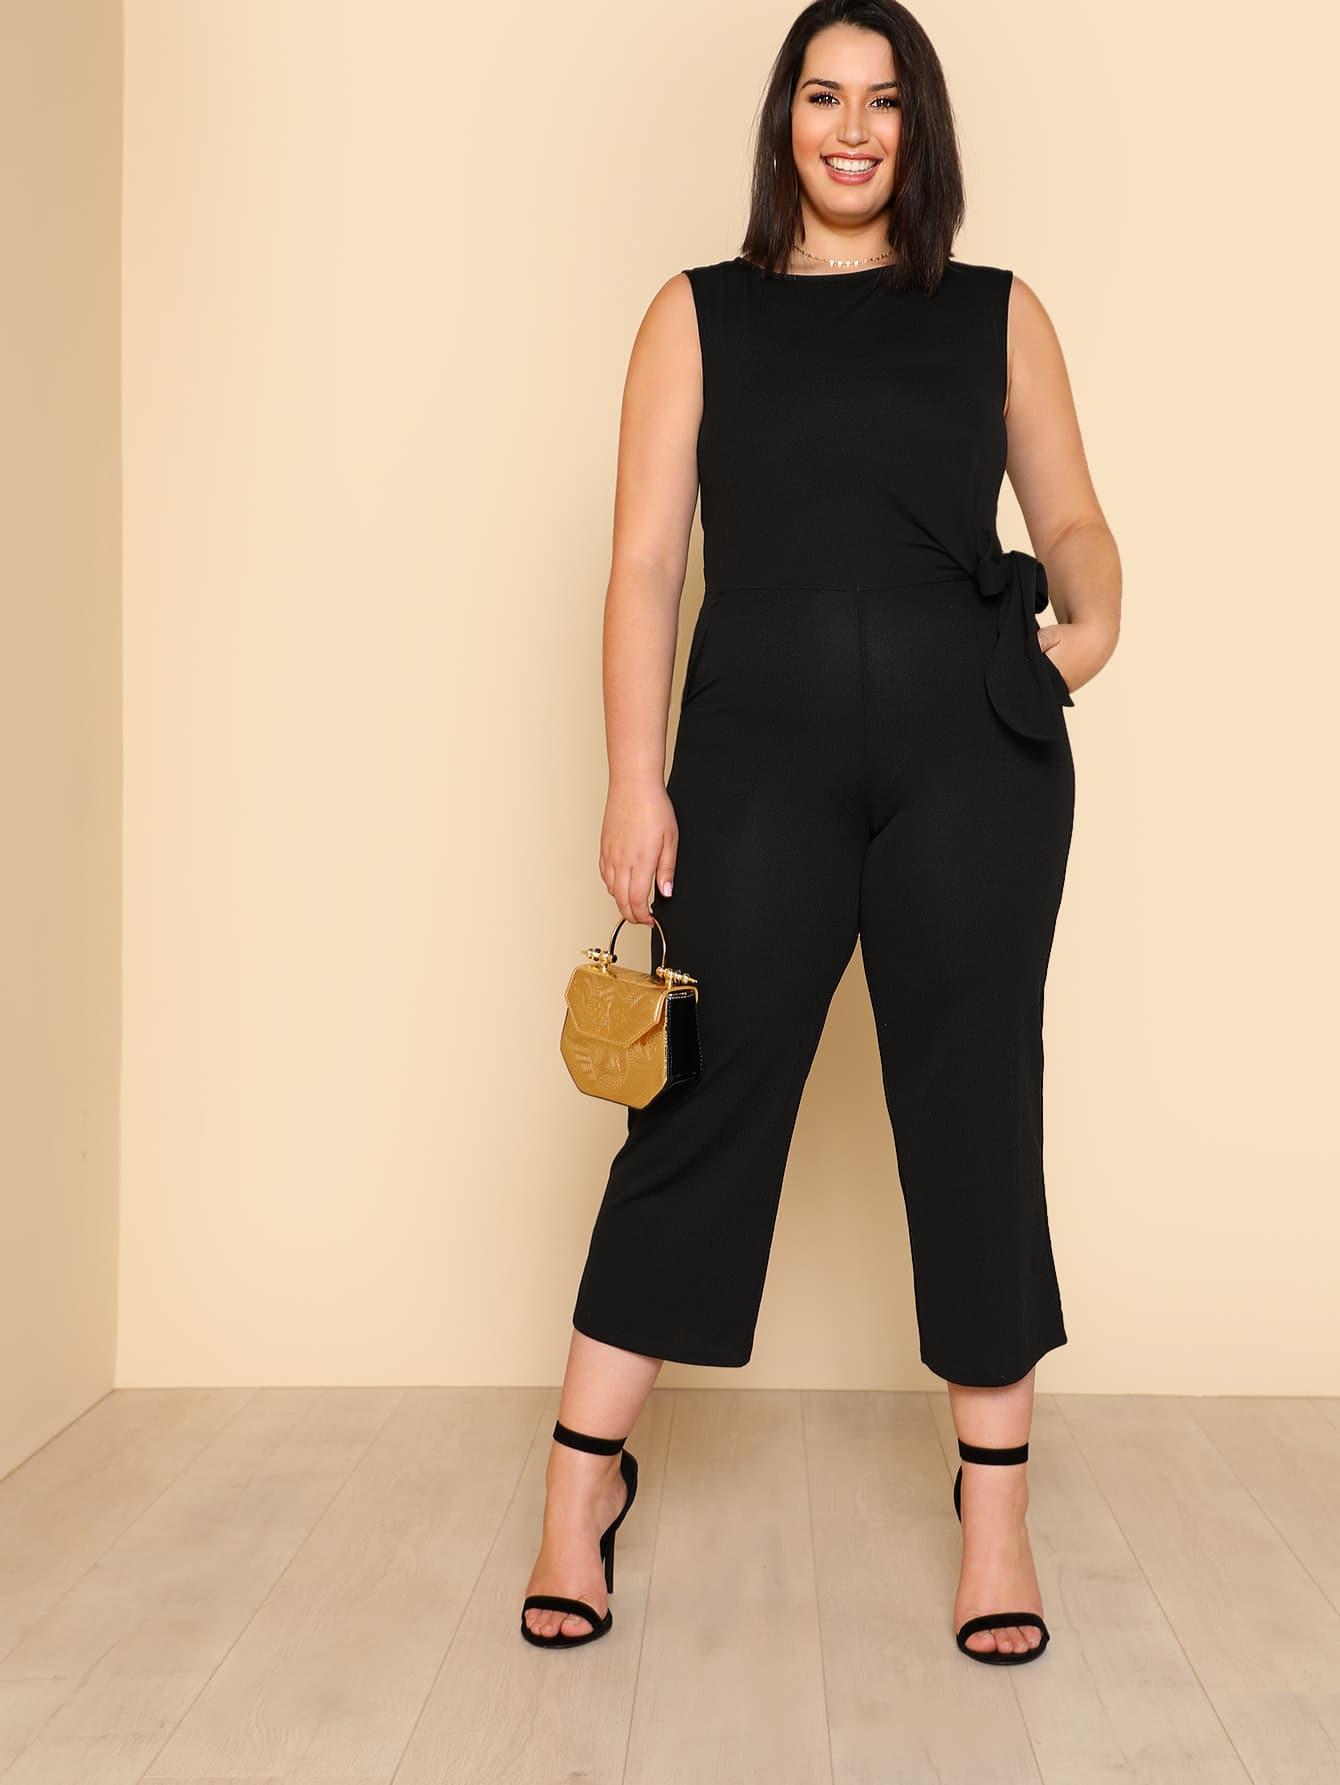 Self Belted Sleeveless Culotte Jumpsuit lauren ralph lauren new sleeveless tie belt jumpsuit xl $155 dbfl